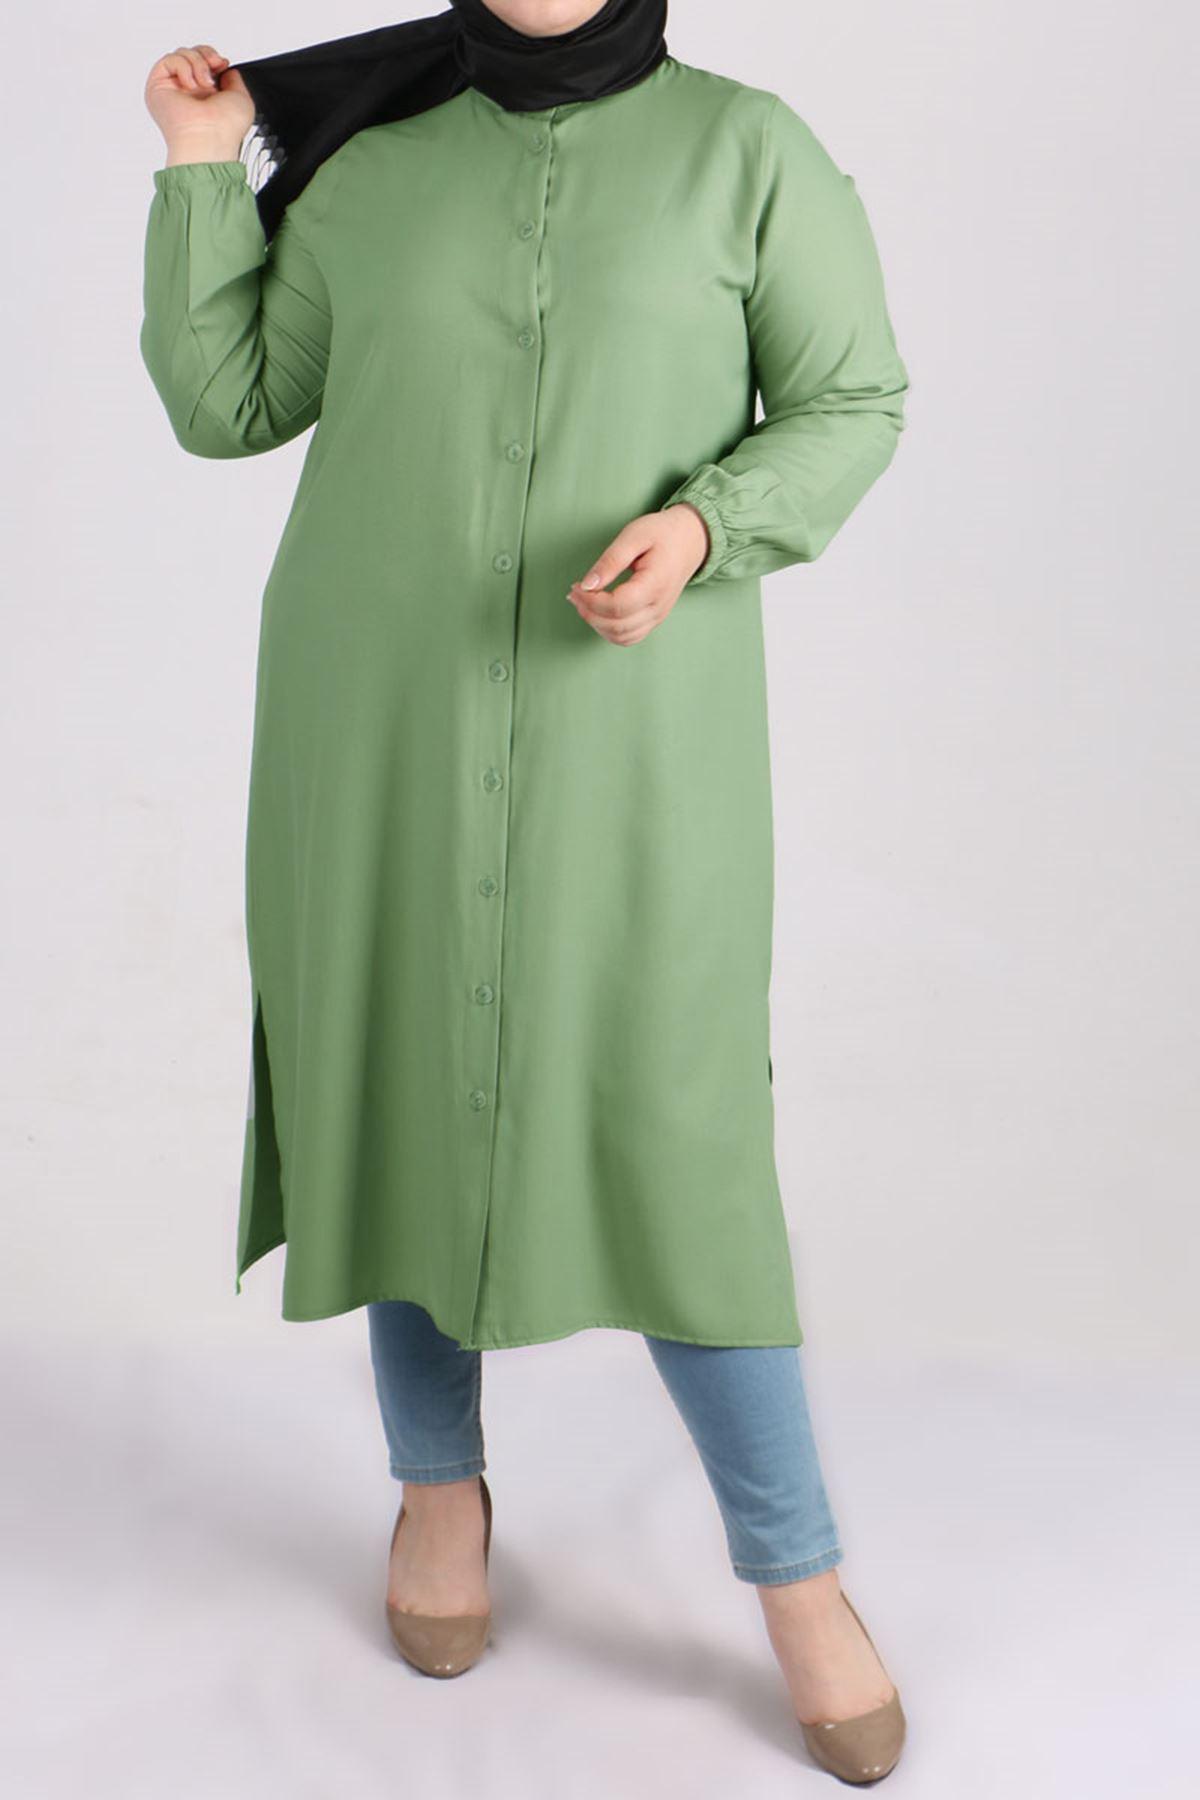 8457 Oversize Tunic- Naphtha Green